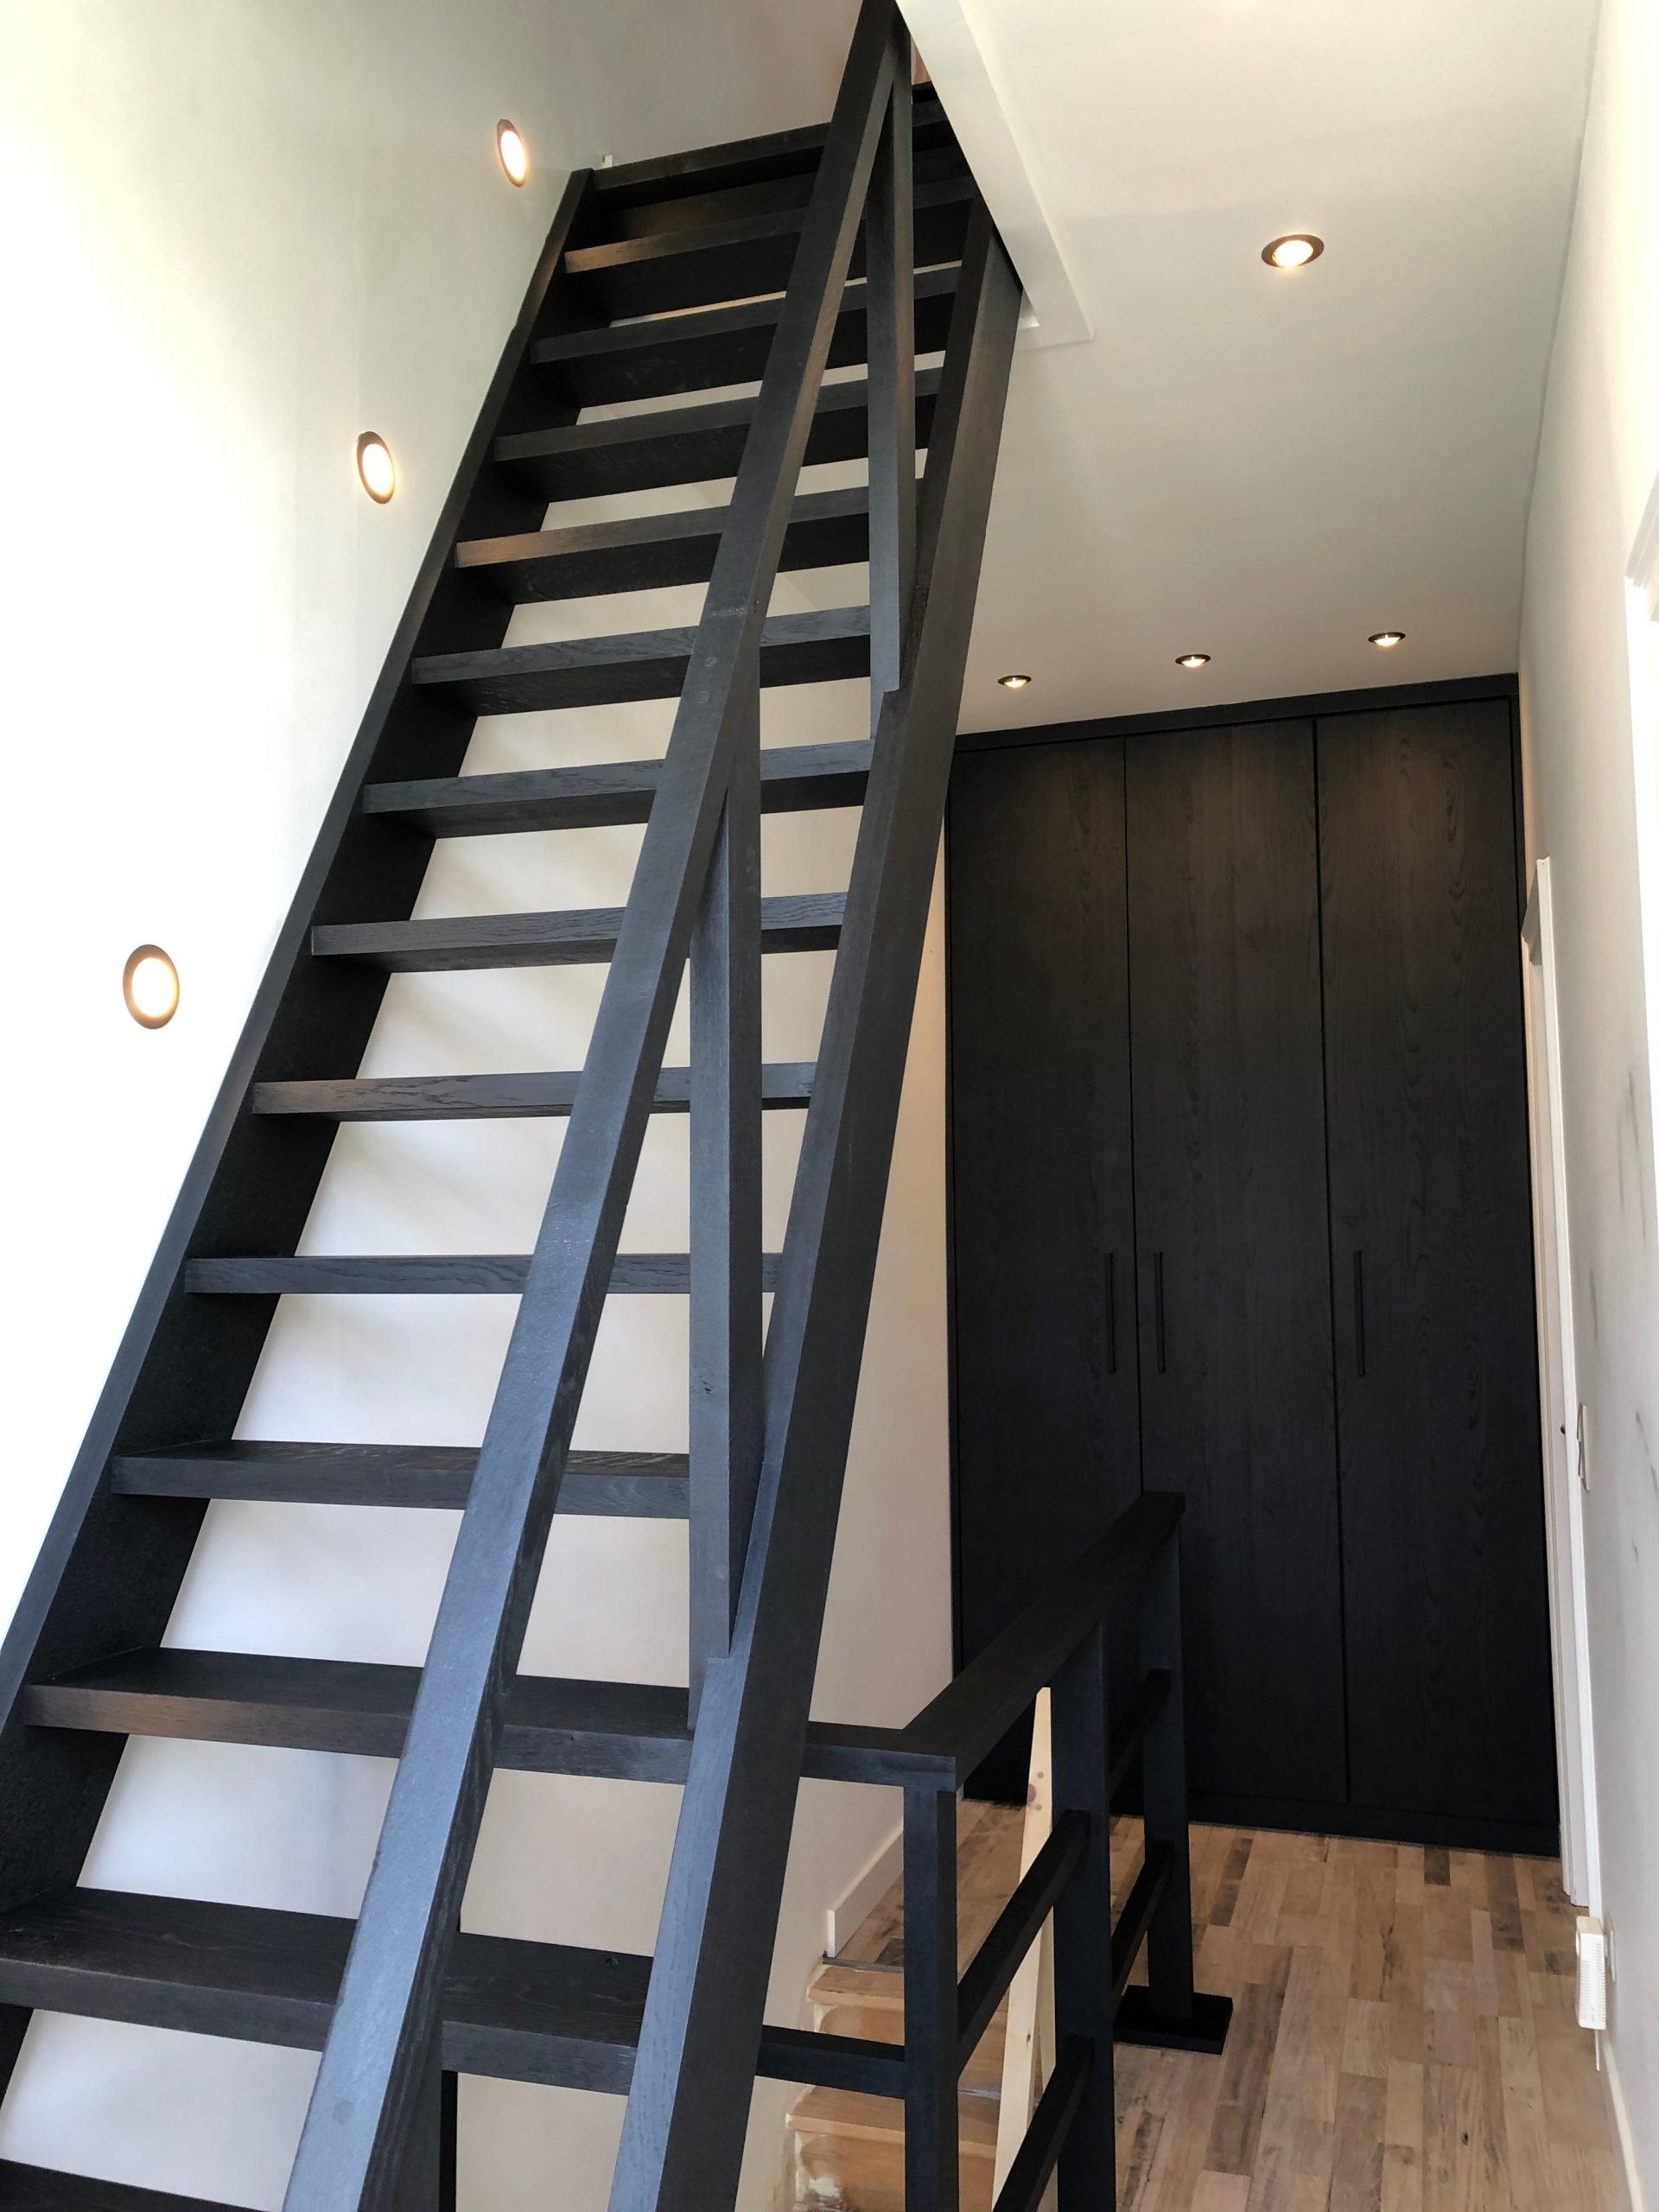 Straight stair & balustrades D.K. – 07/2021